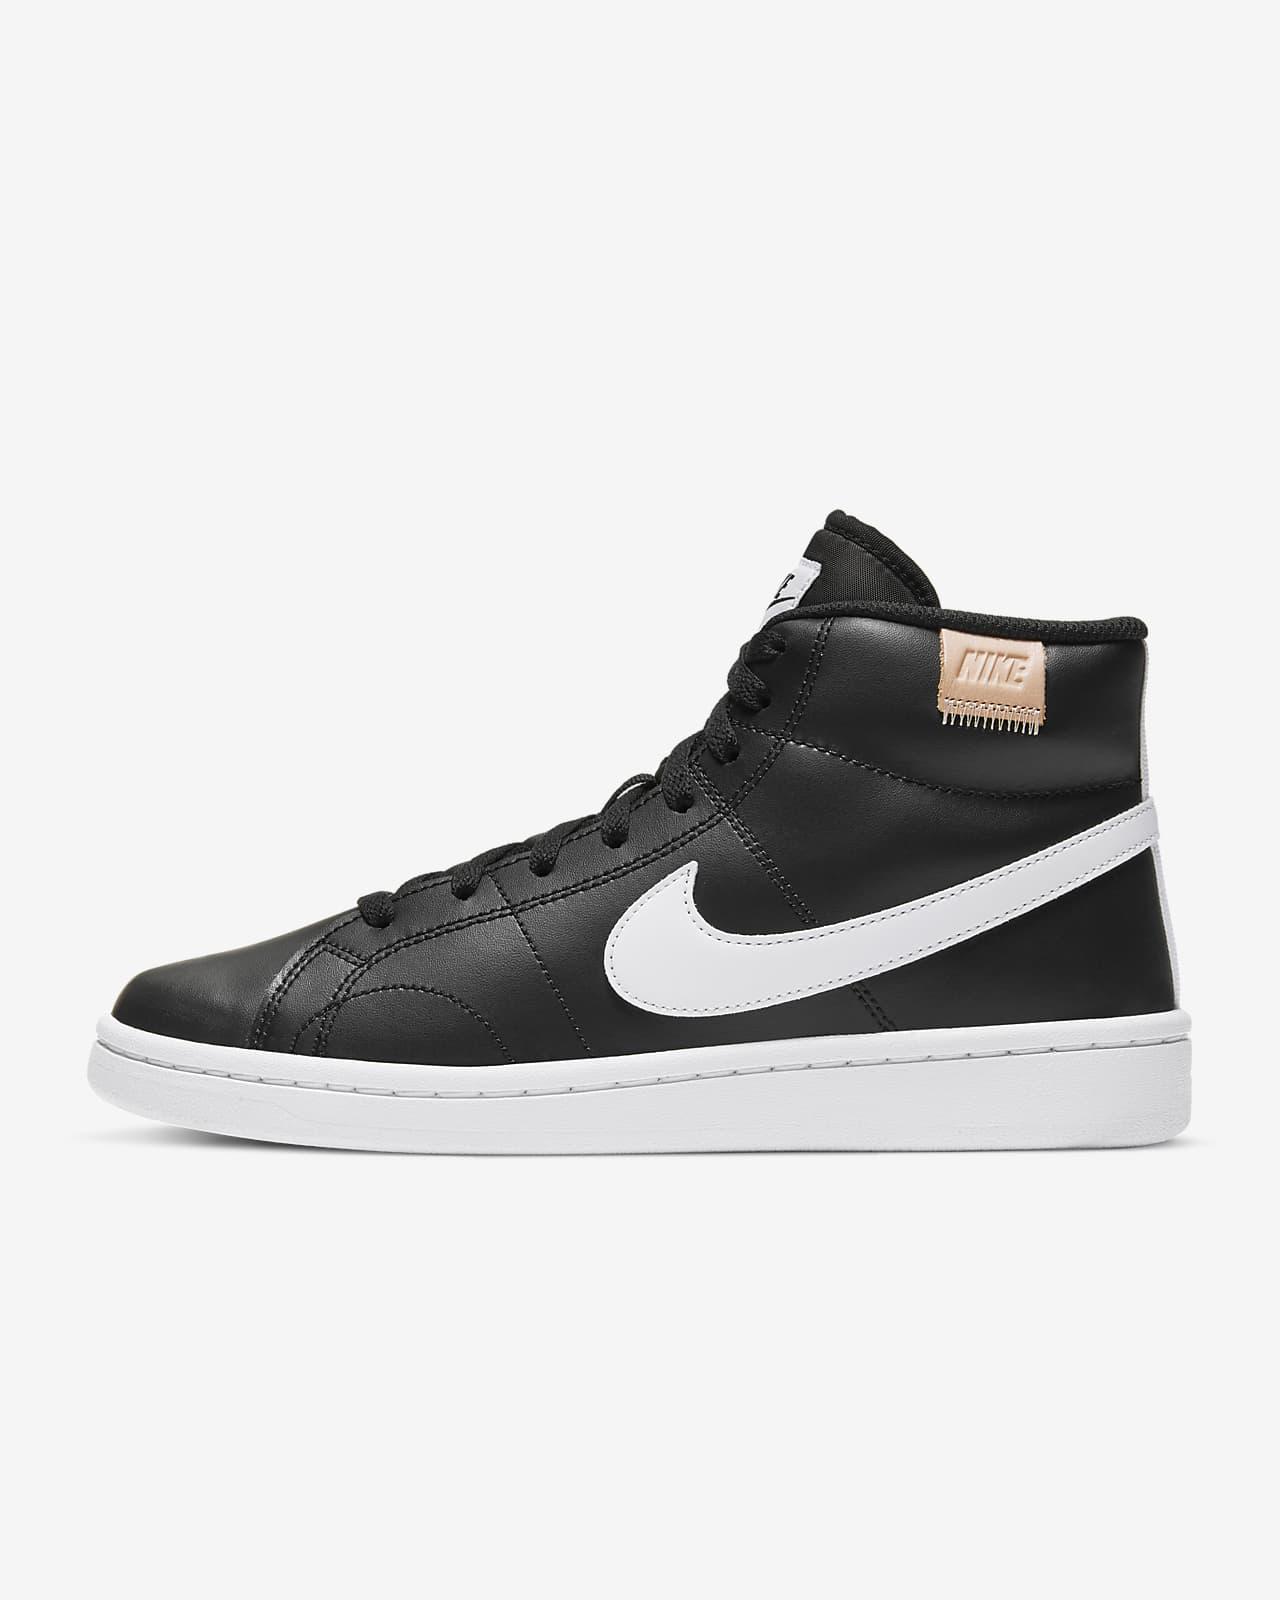 Chaussure Nike Court Royale 2 Mid pour Femme